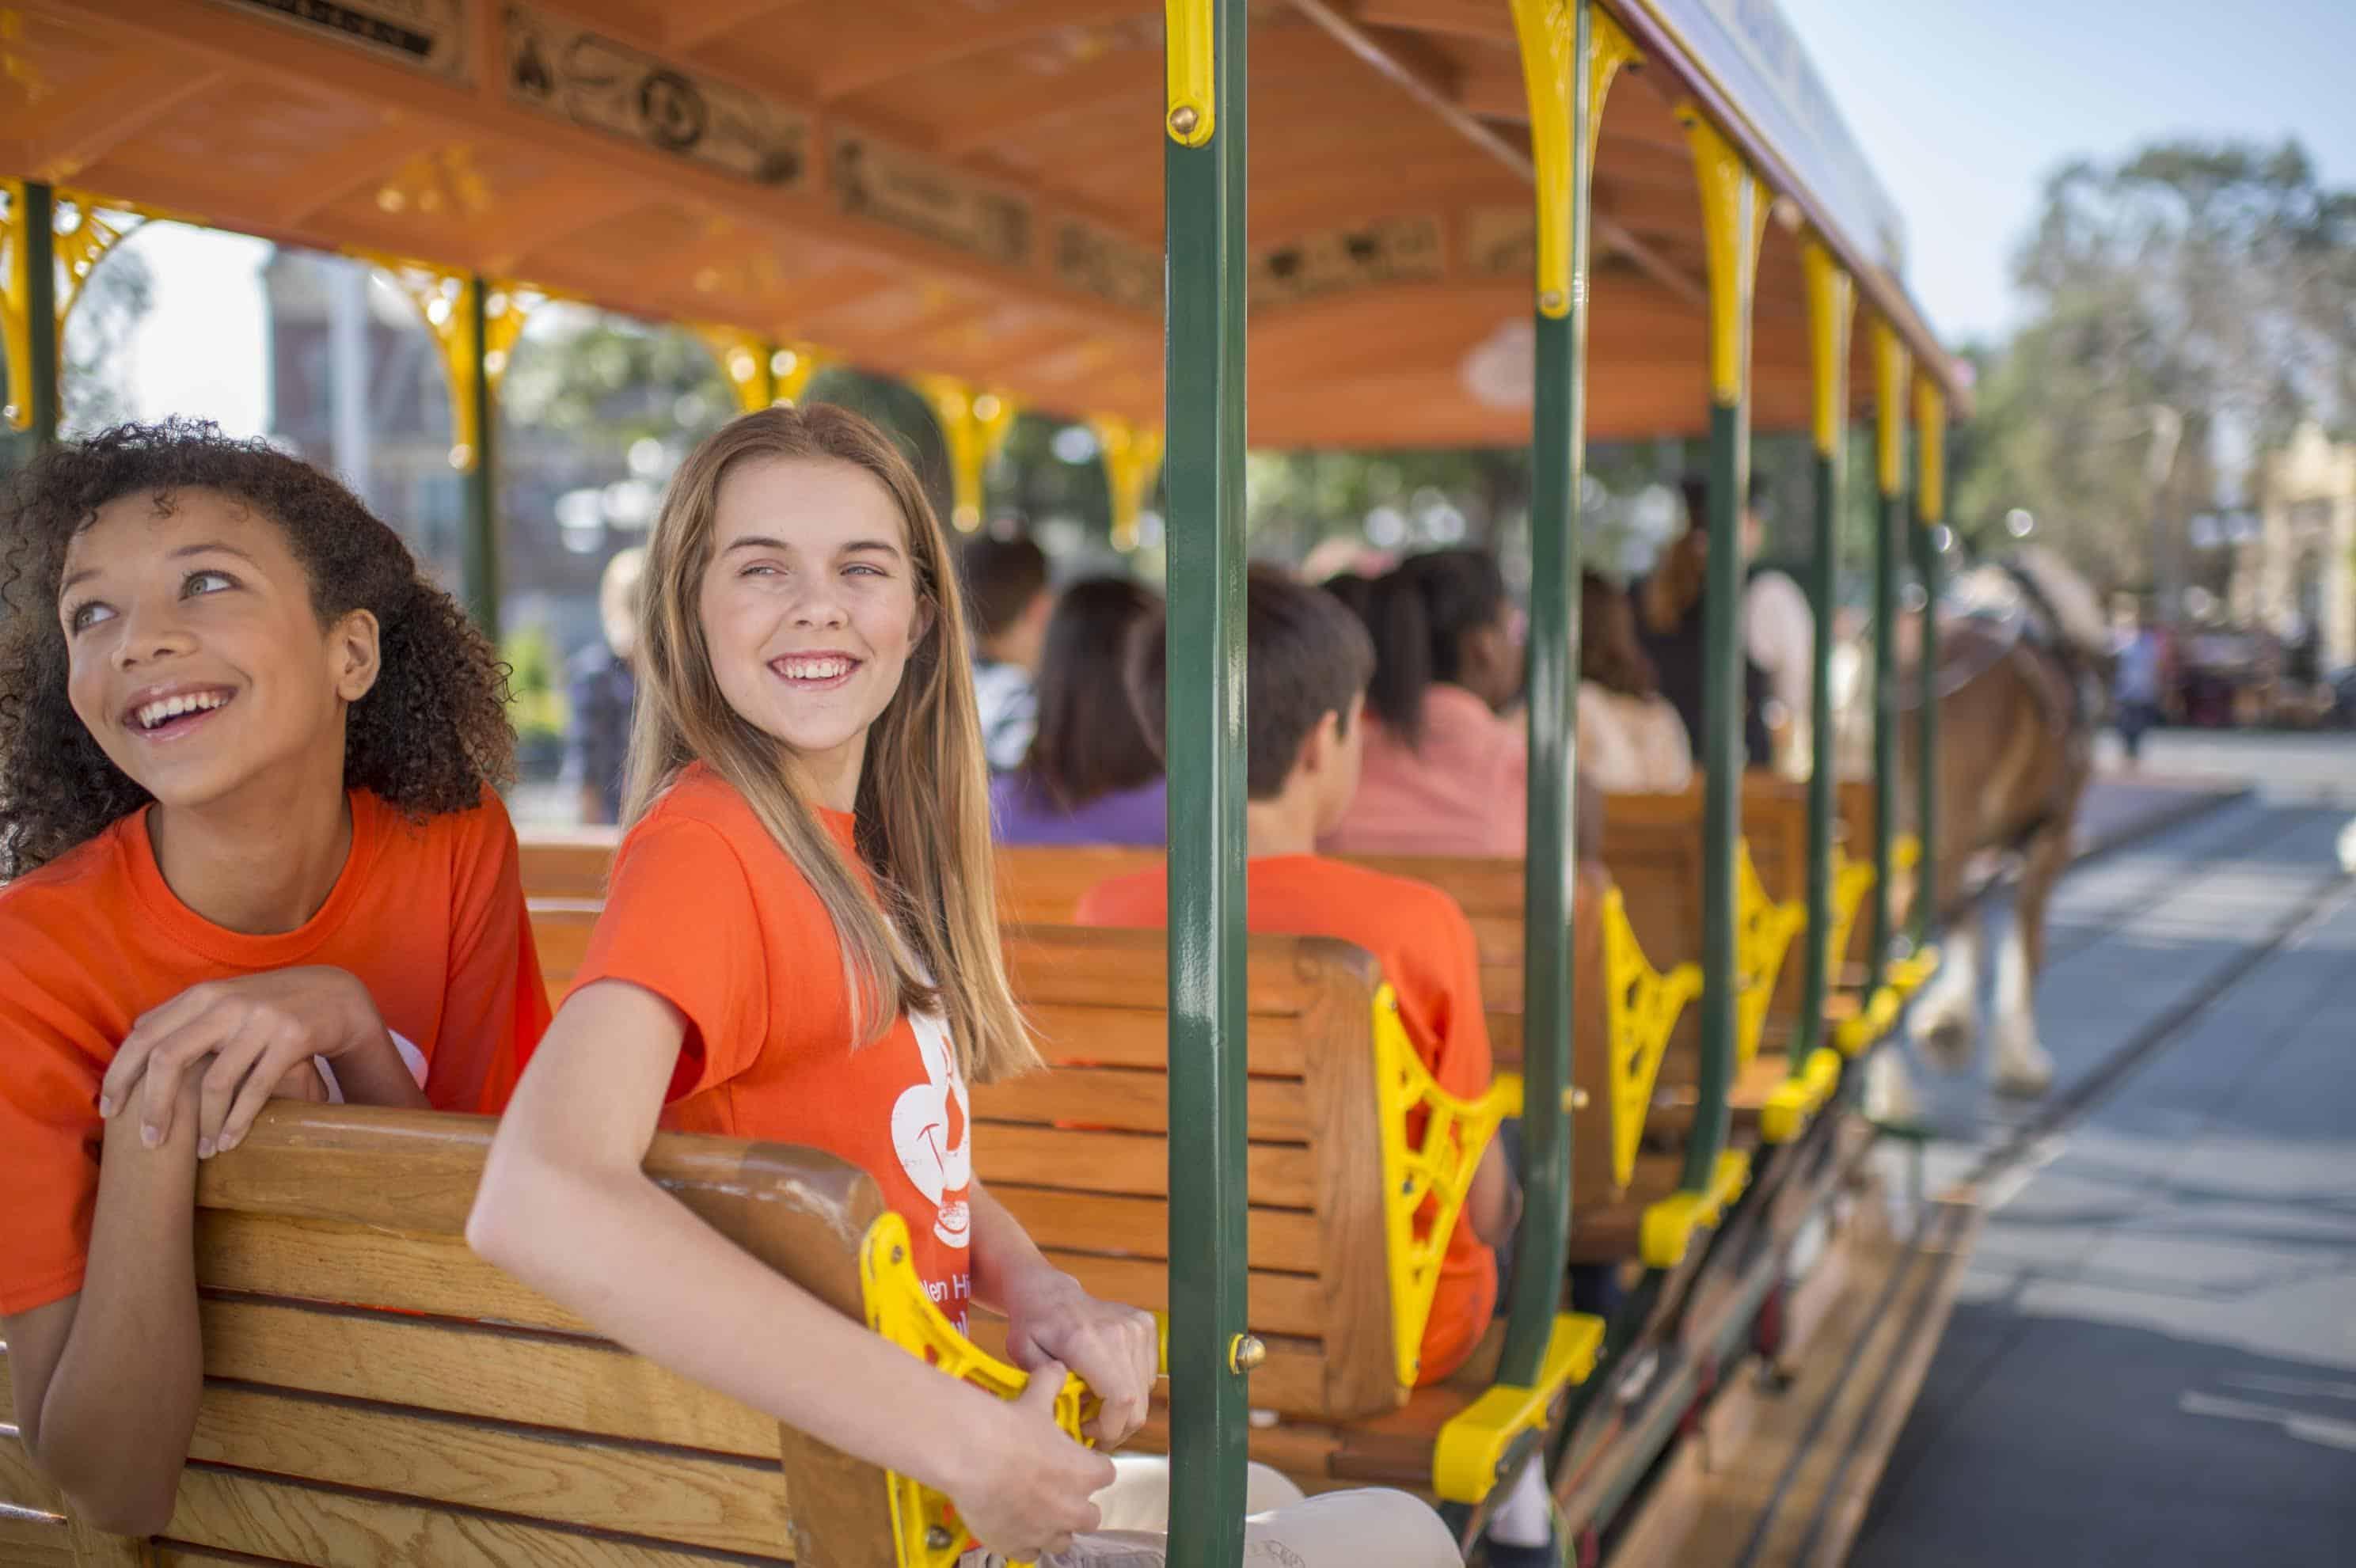 Kids on a Disney Trolley- image by Walt Disney World.